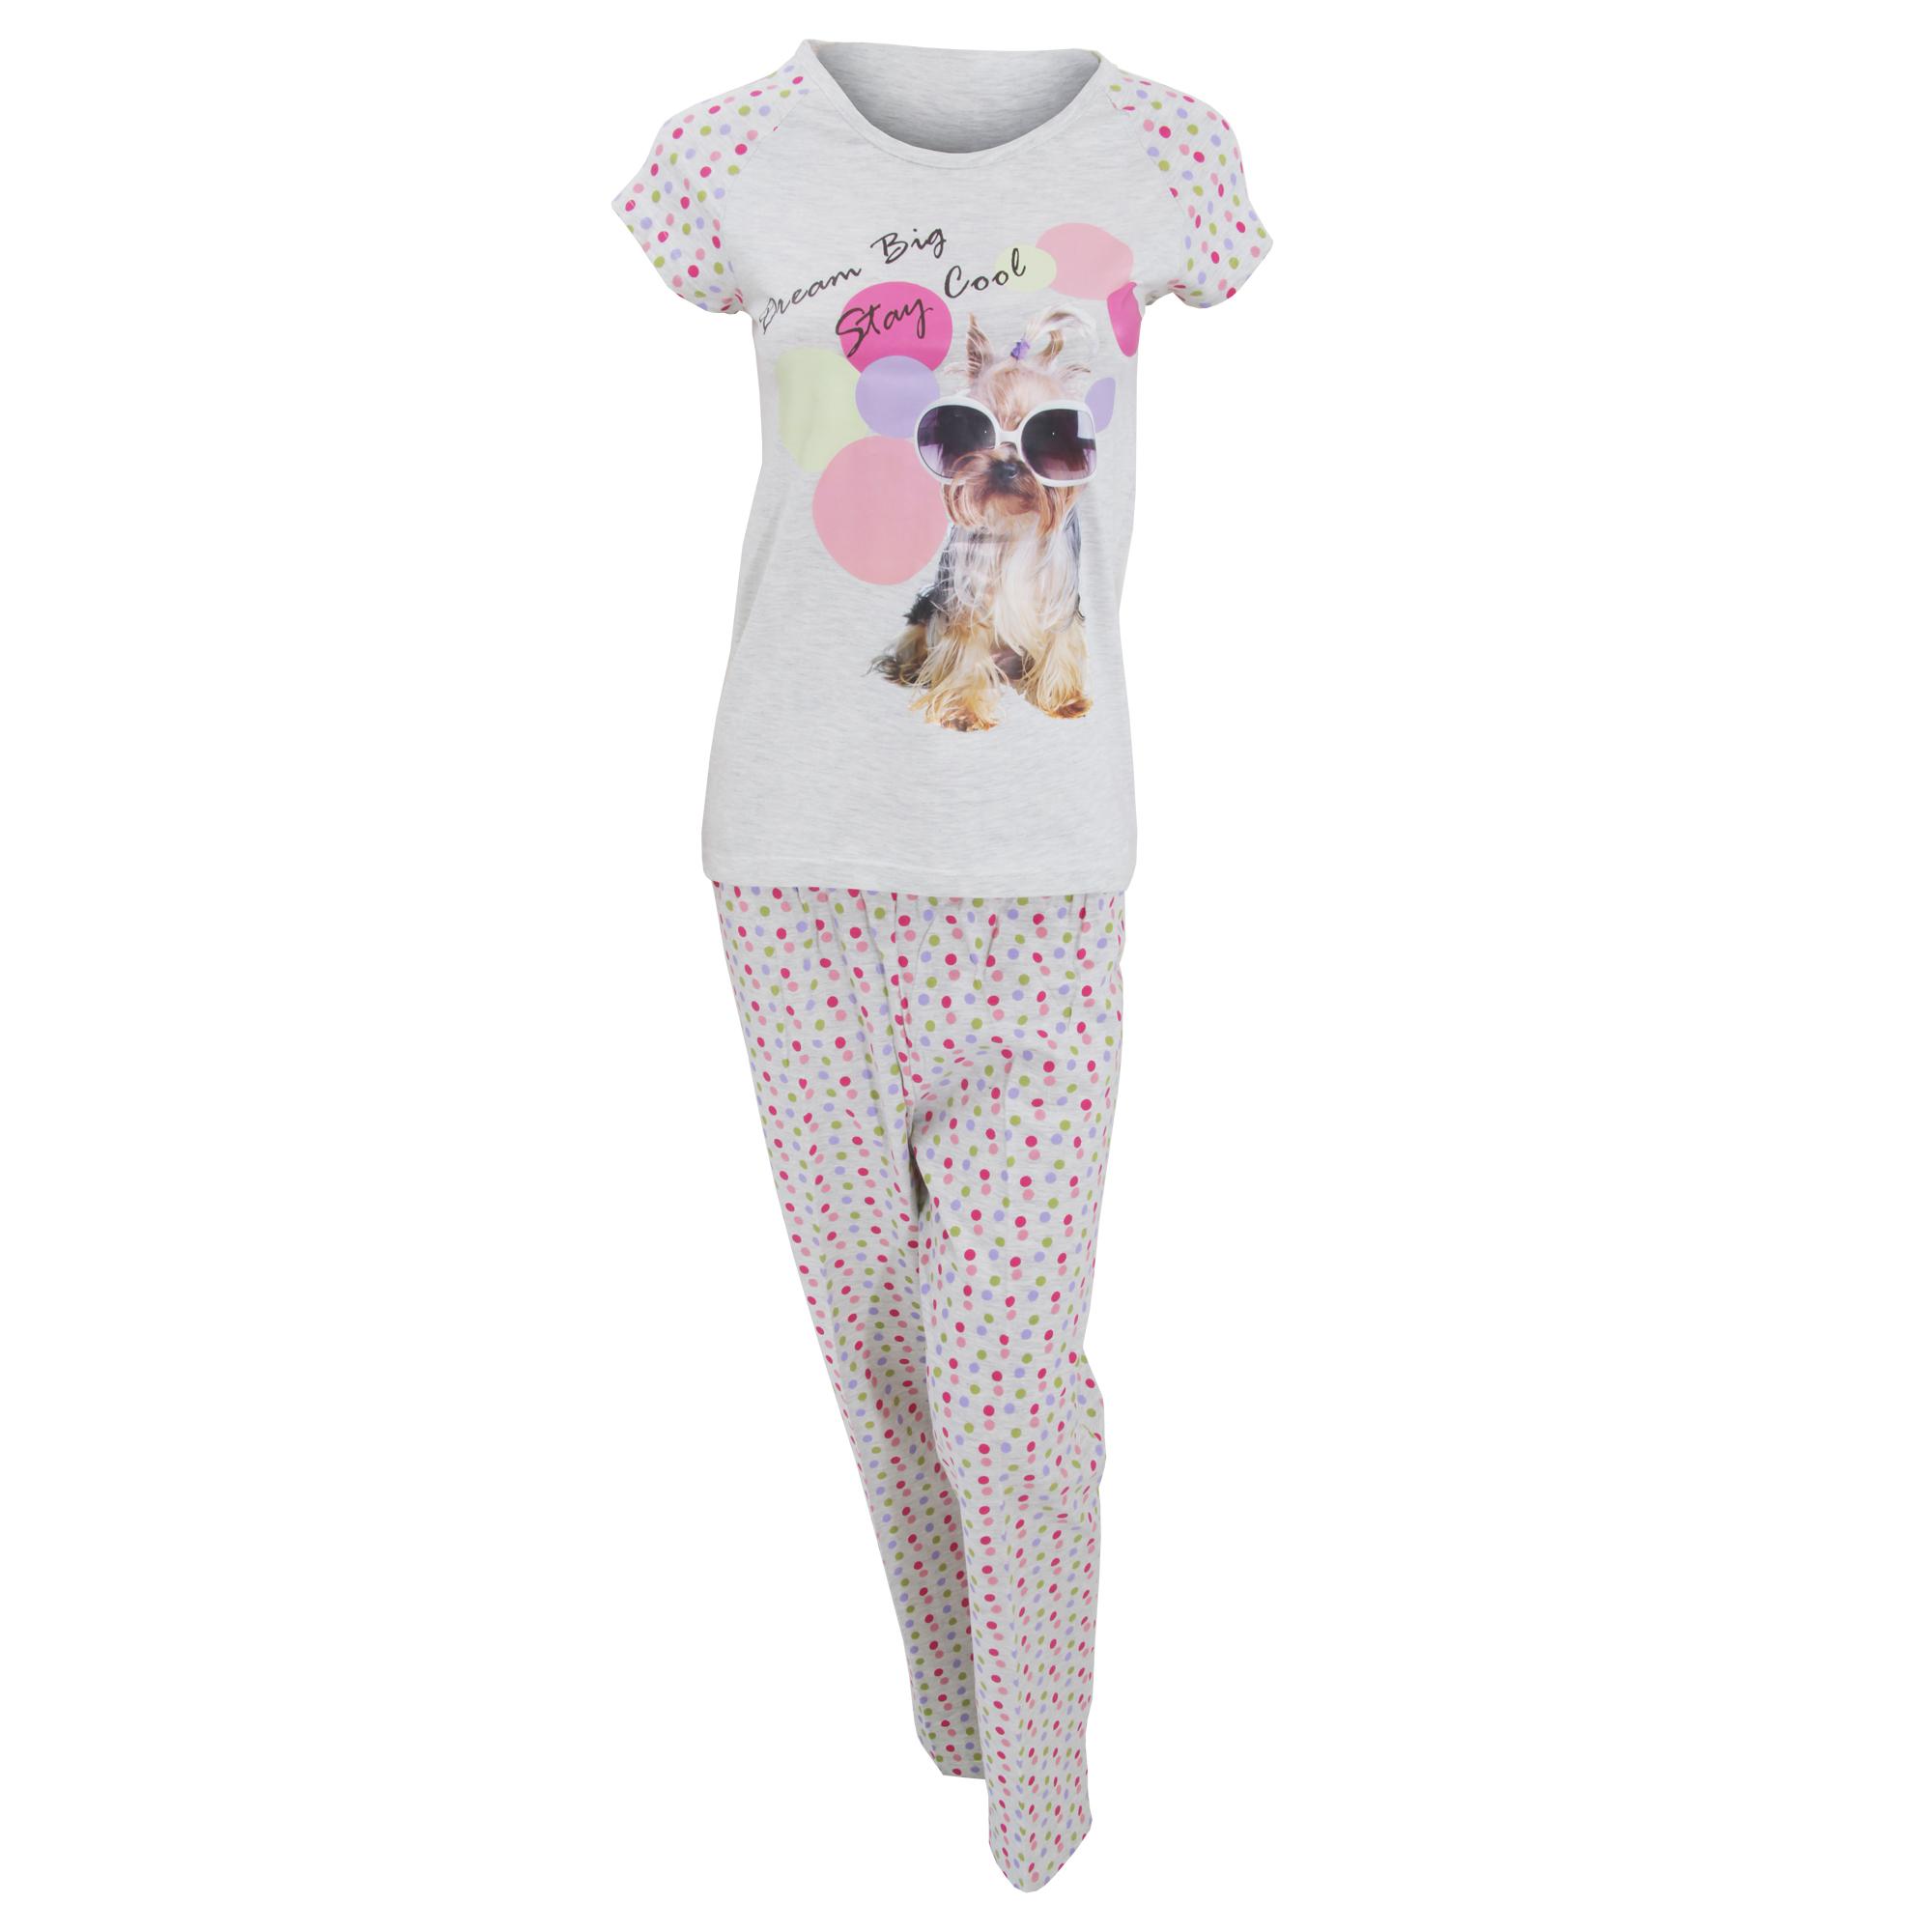 damen schlafanzug pyjama mit hundemotiv kurzarm t shirt und lange hose ebay. Black Bedroom Furniture Sets. Home Design Ideas